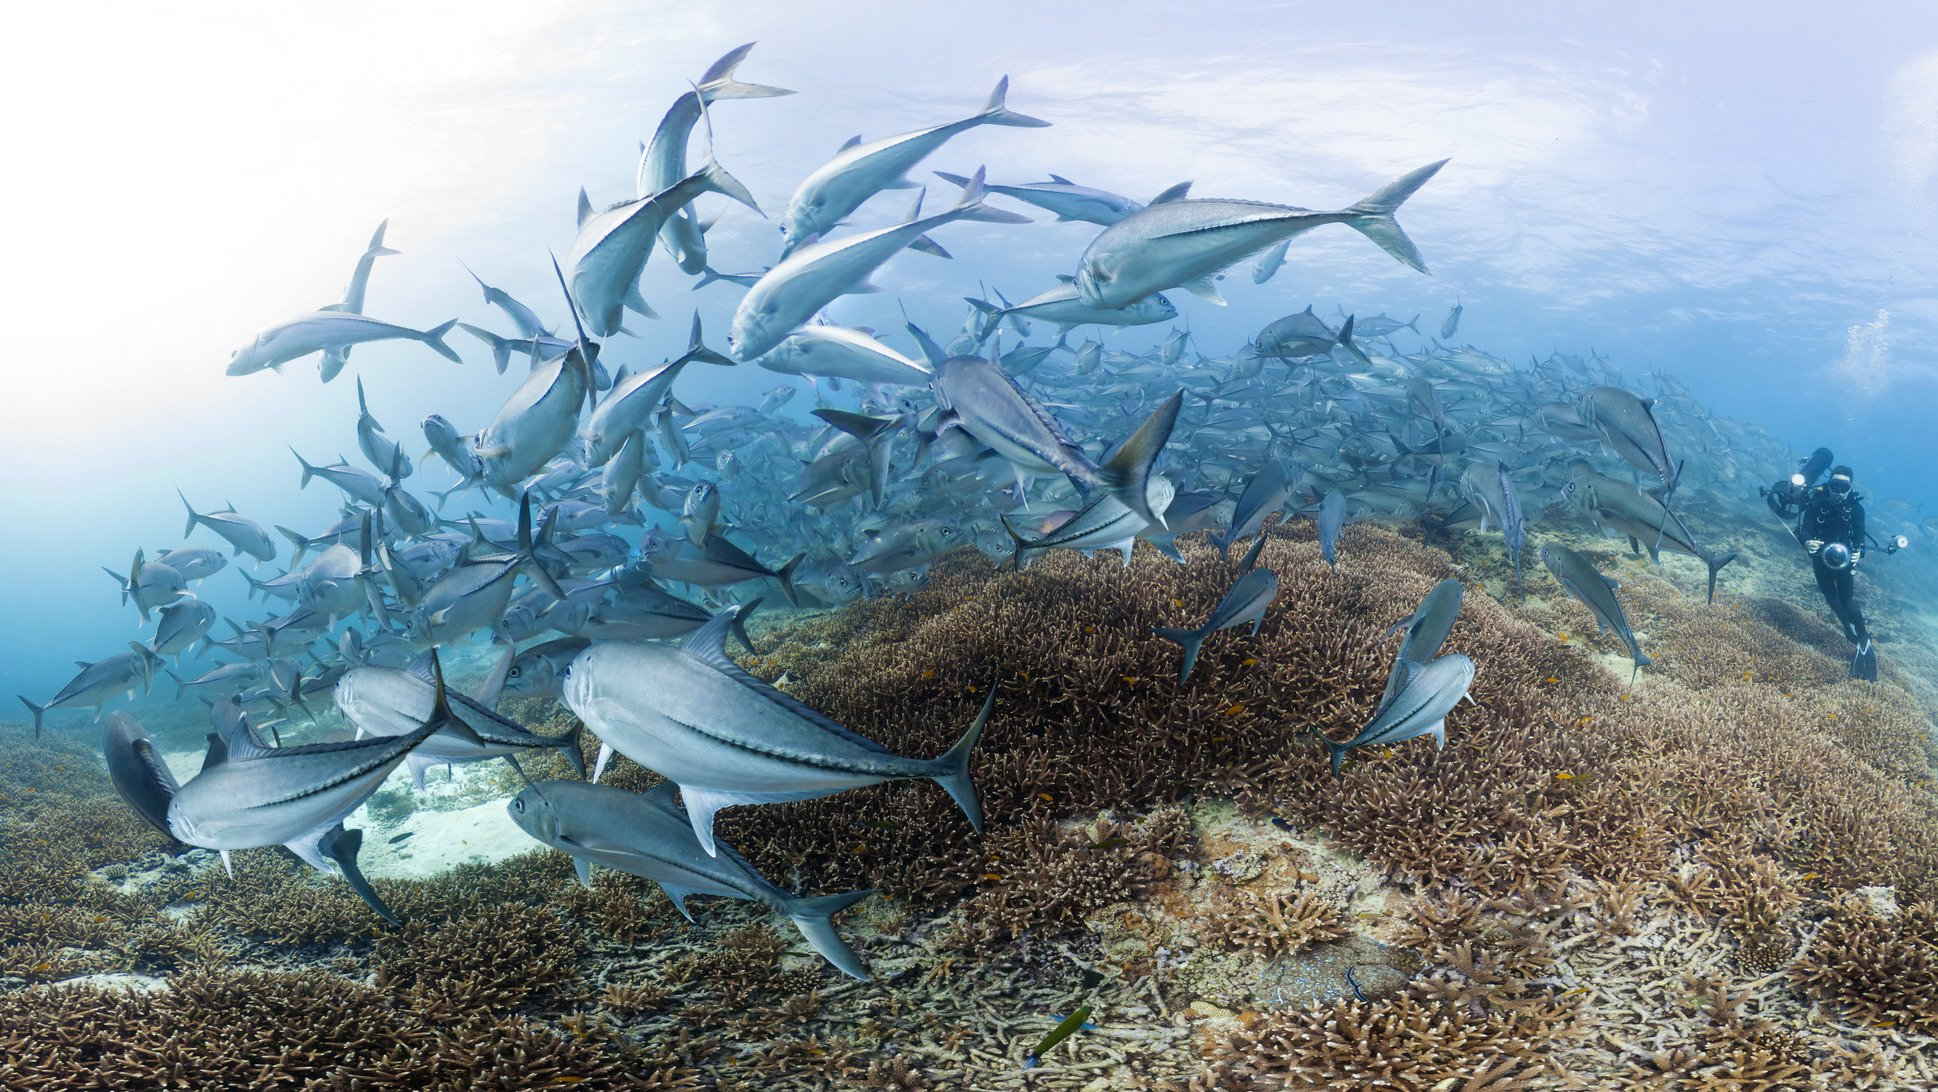 Google Keyword Chasing Coral Image 002.jpg